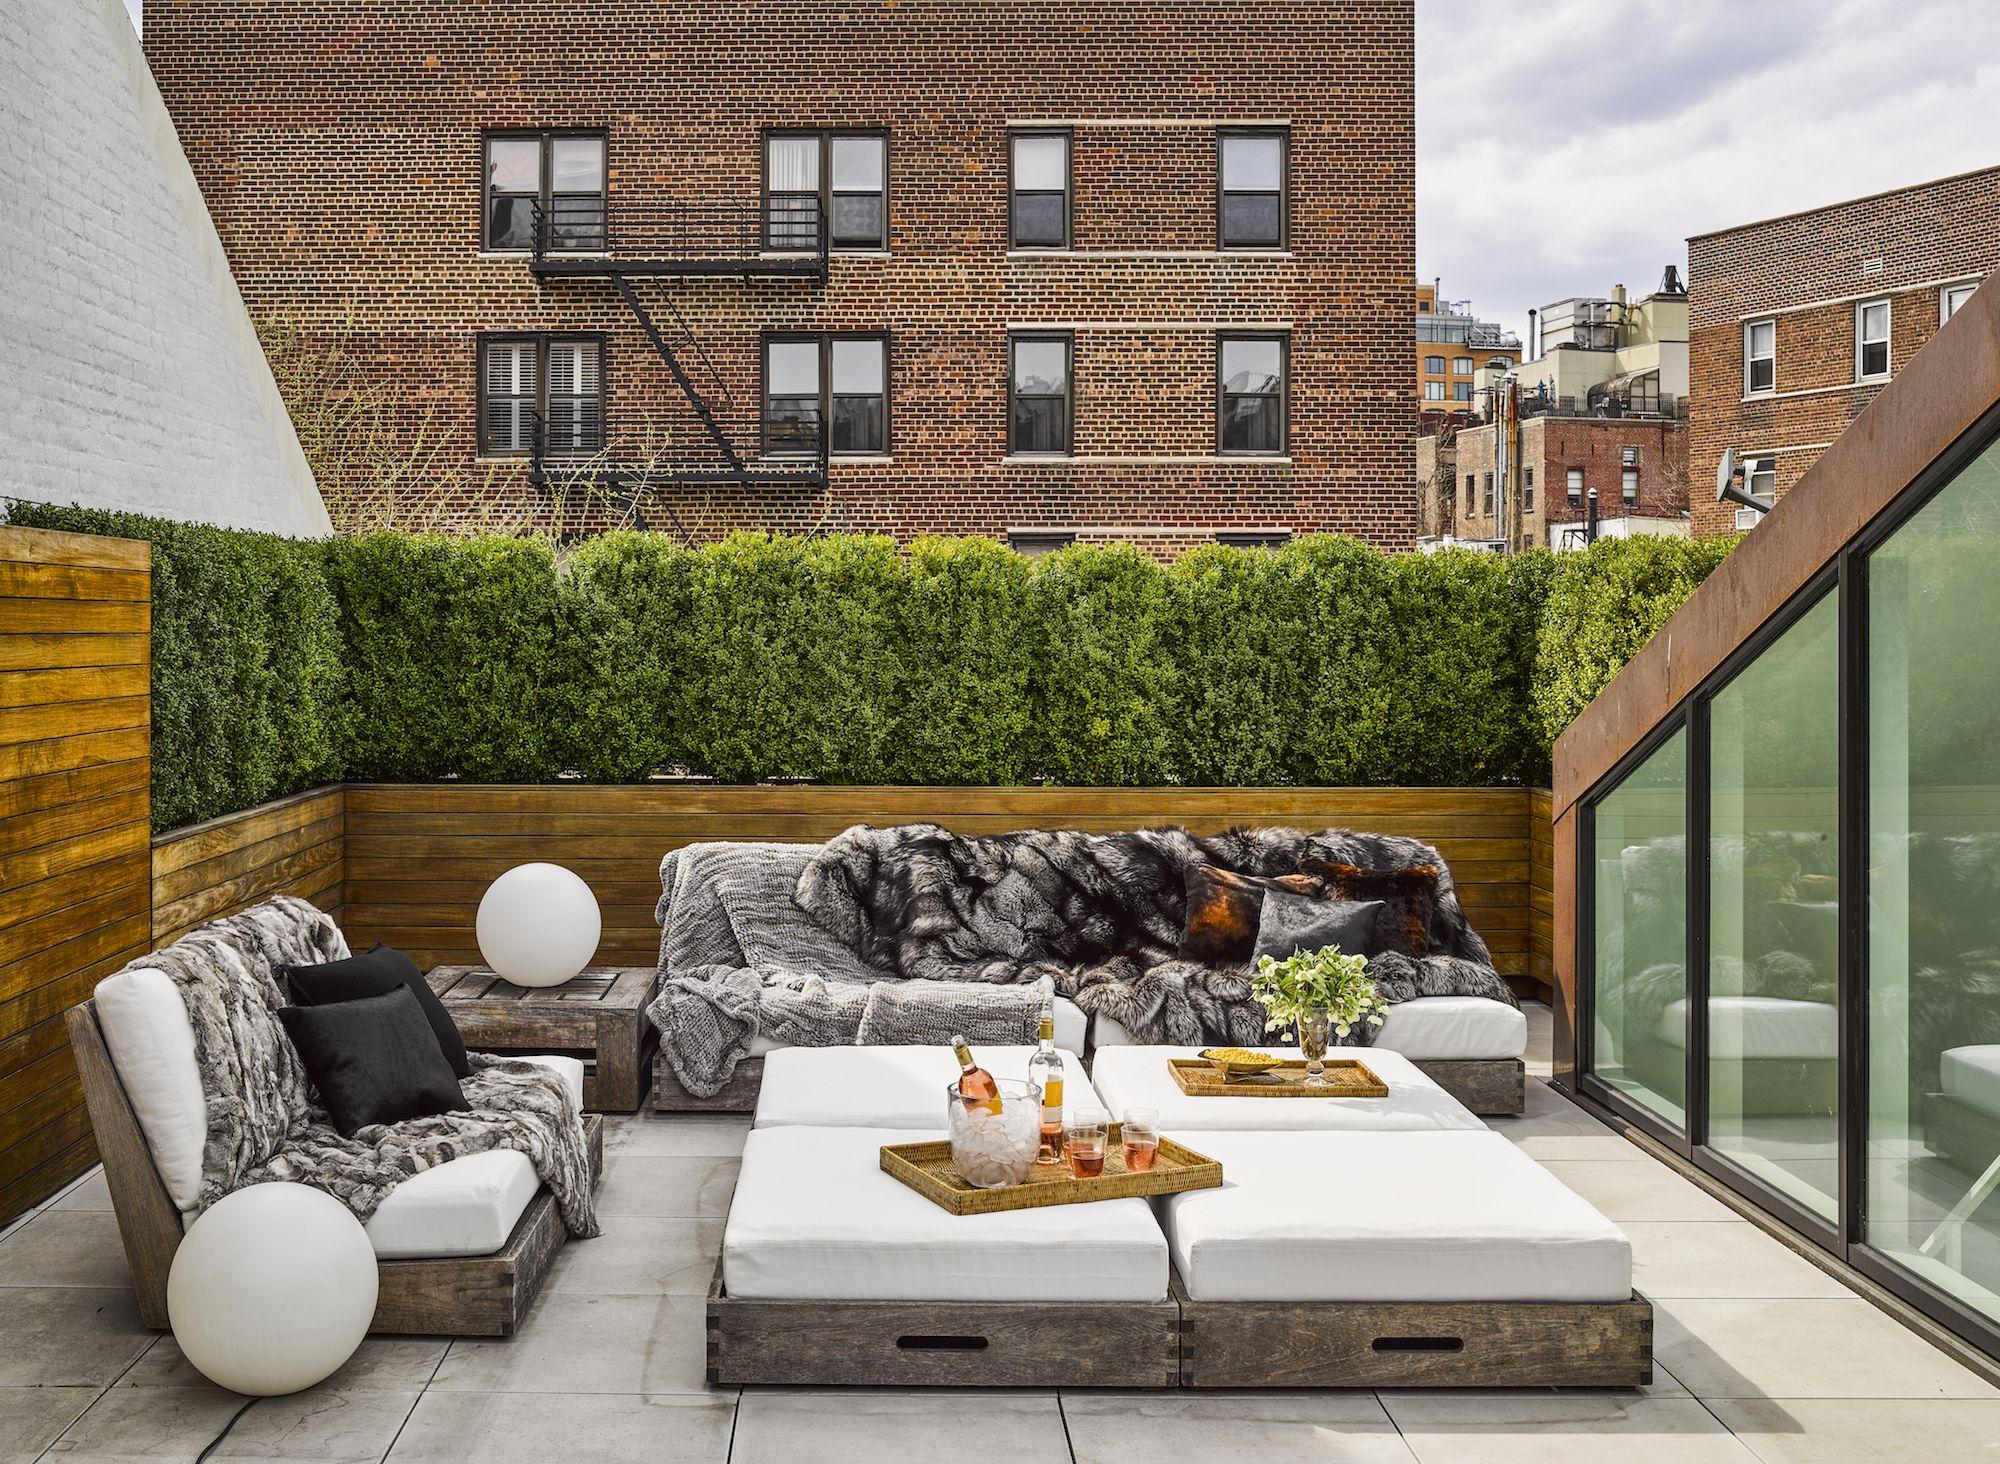 outdoor patio ideas image MZTQEOW